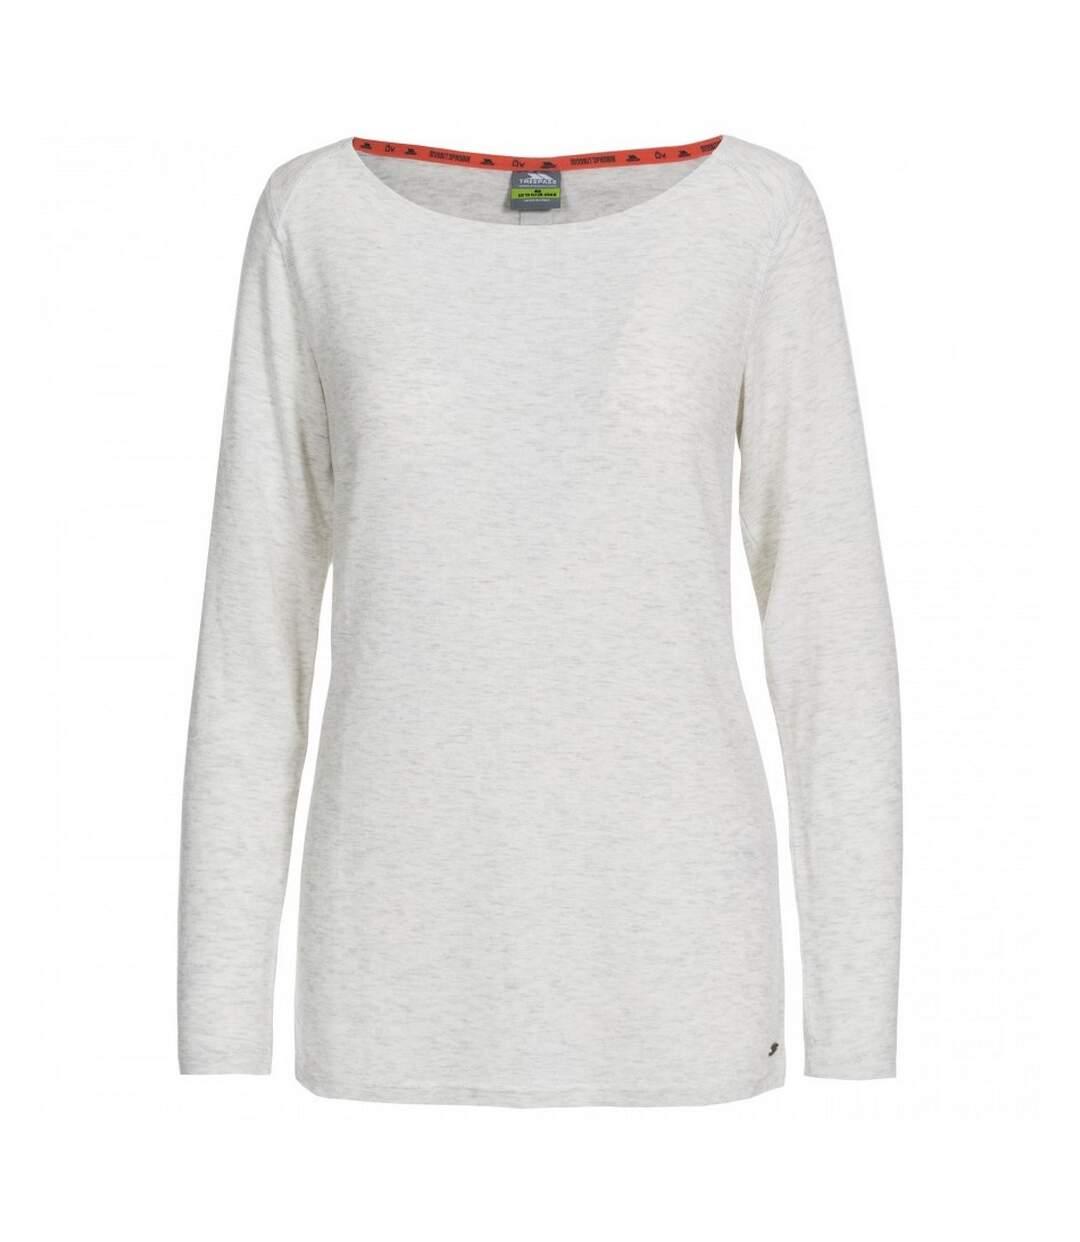 Trespass - Haut Manches Longues Daintree - Femme (Blanc chiné) - UTTP4712